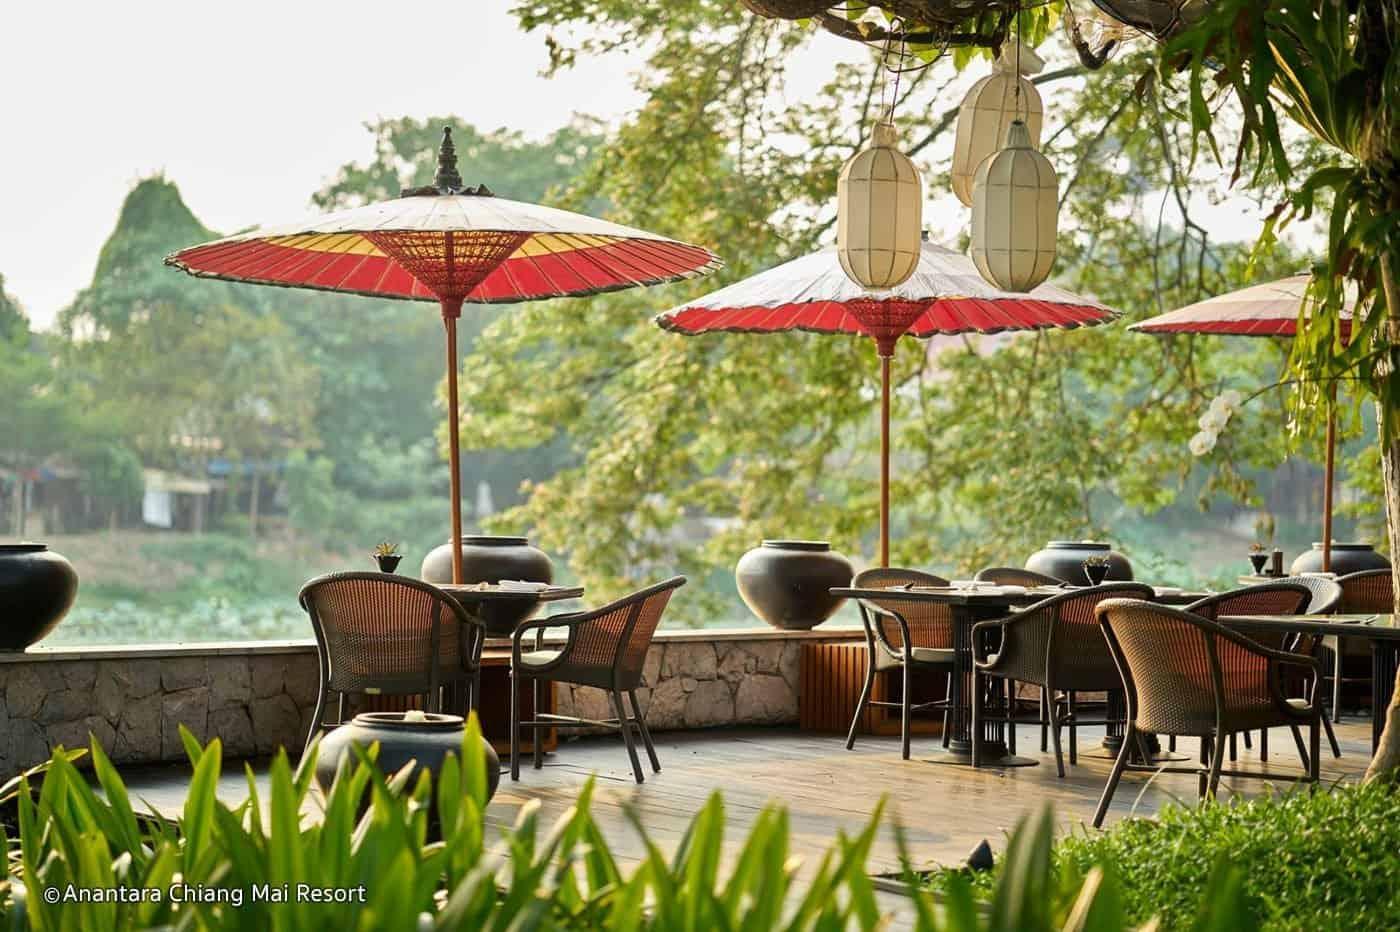 Restaurant de l'Anantara Chiang Mai Resort